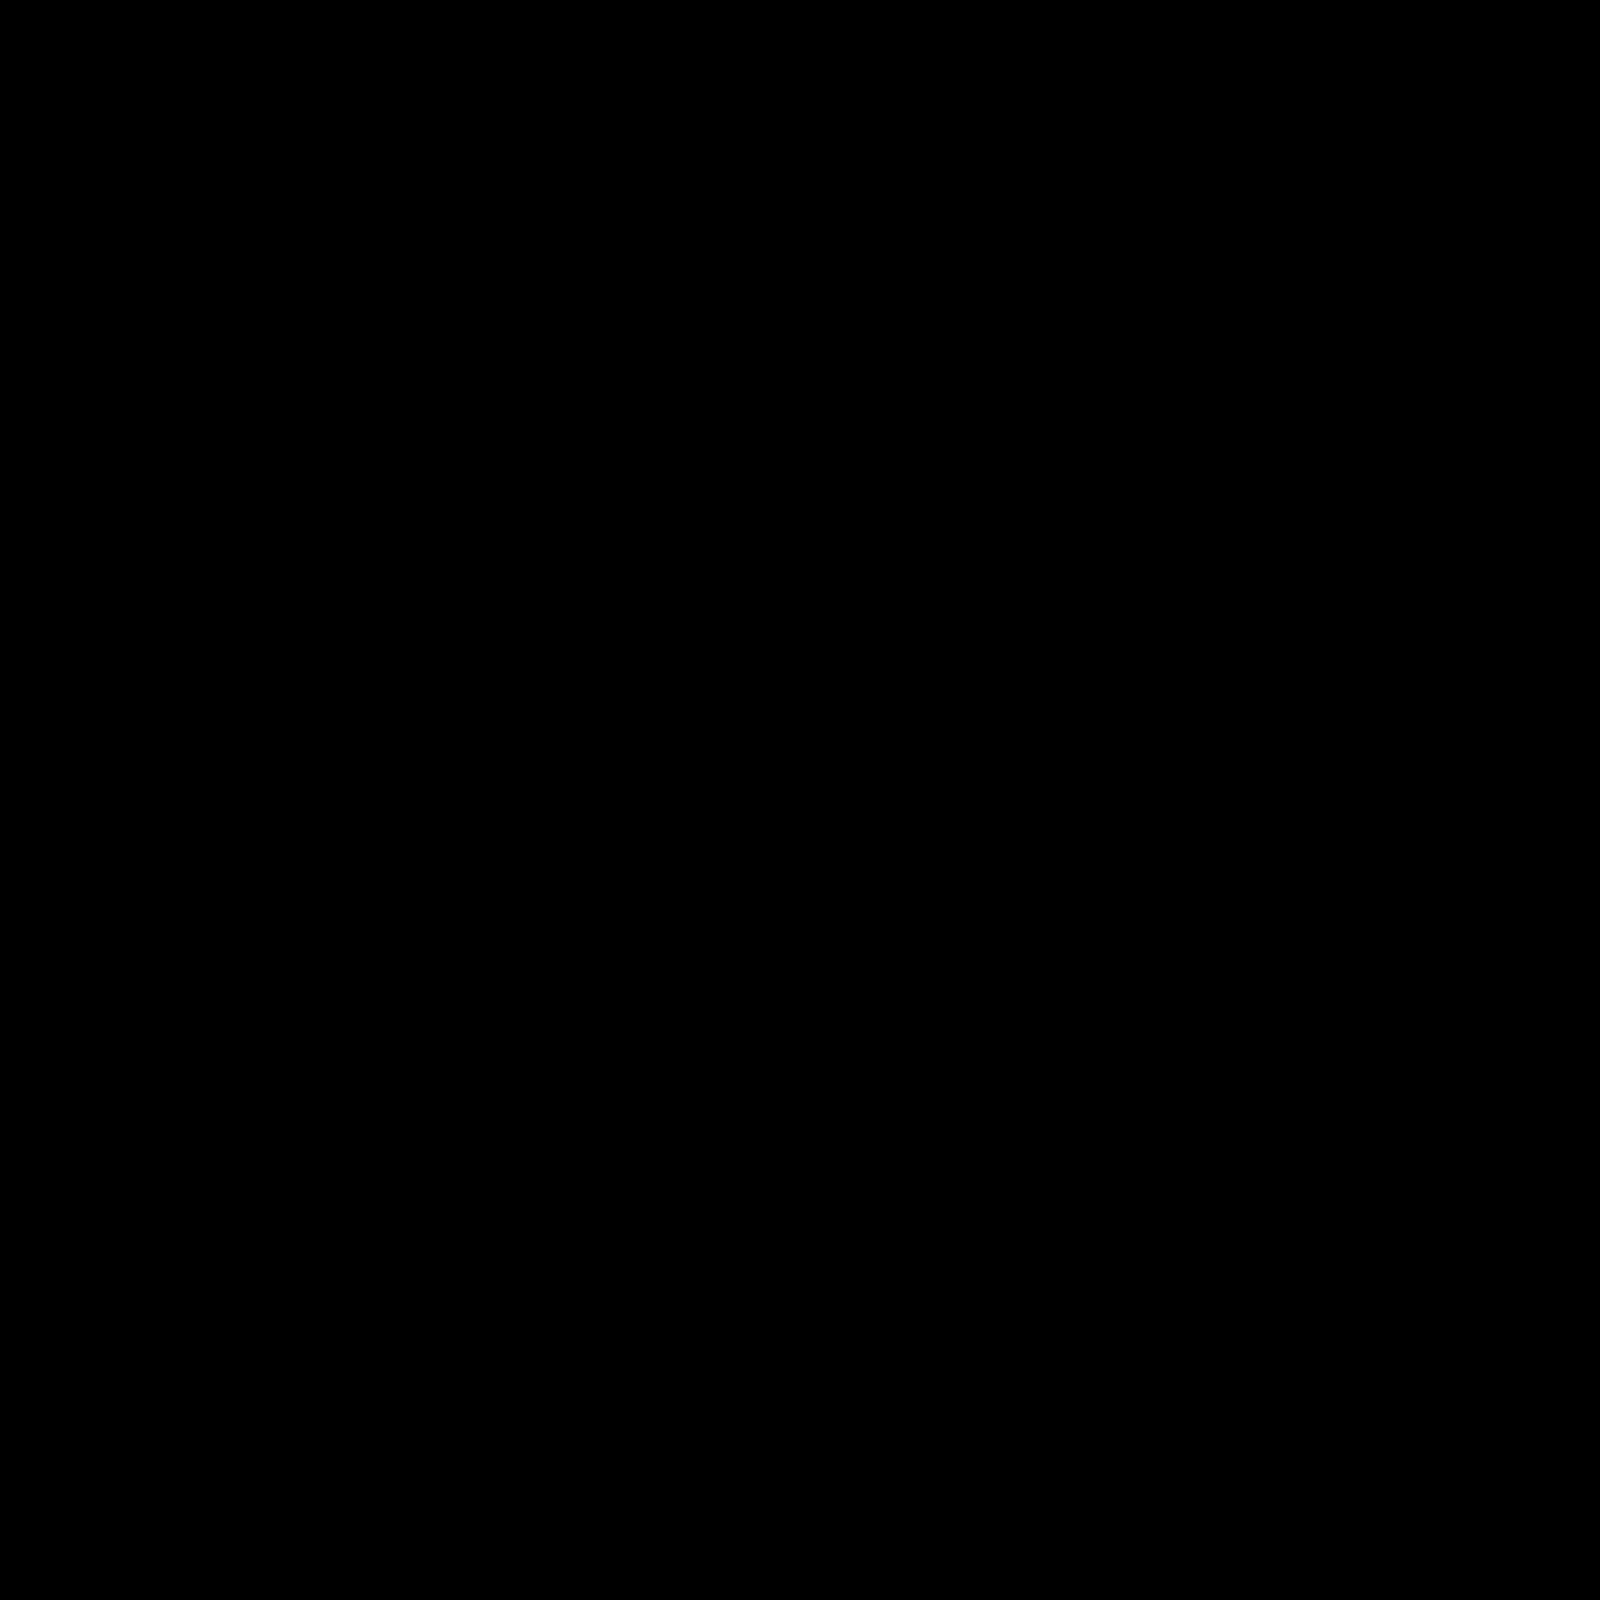 Popcorn Filled icon